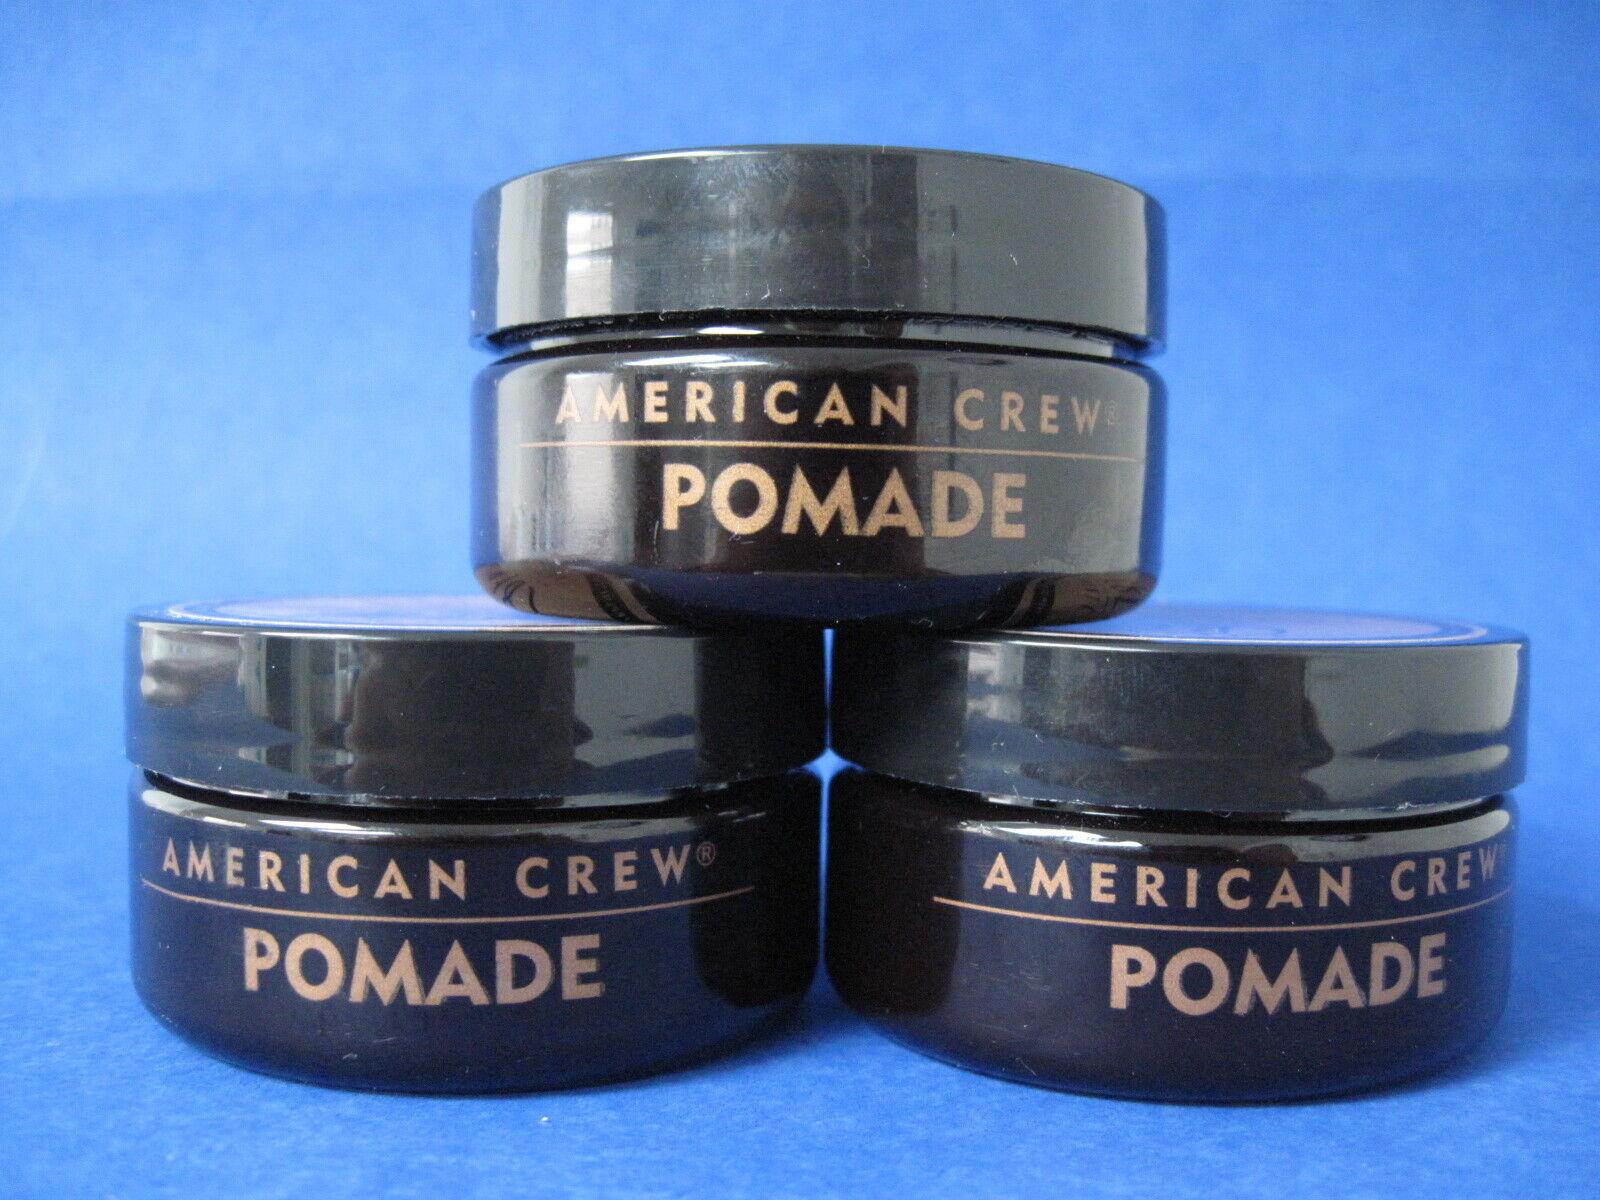 American Crew Pomade 1.75 oz Lot of 3